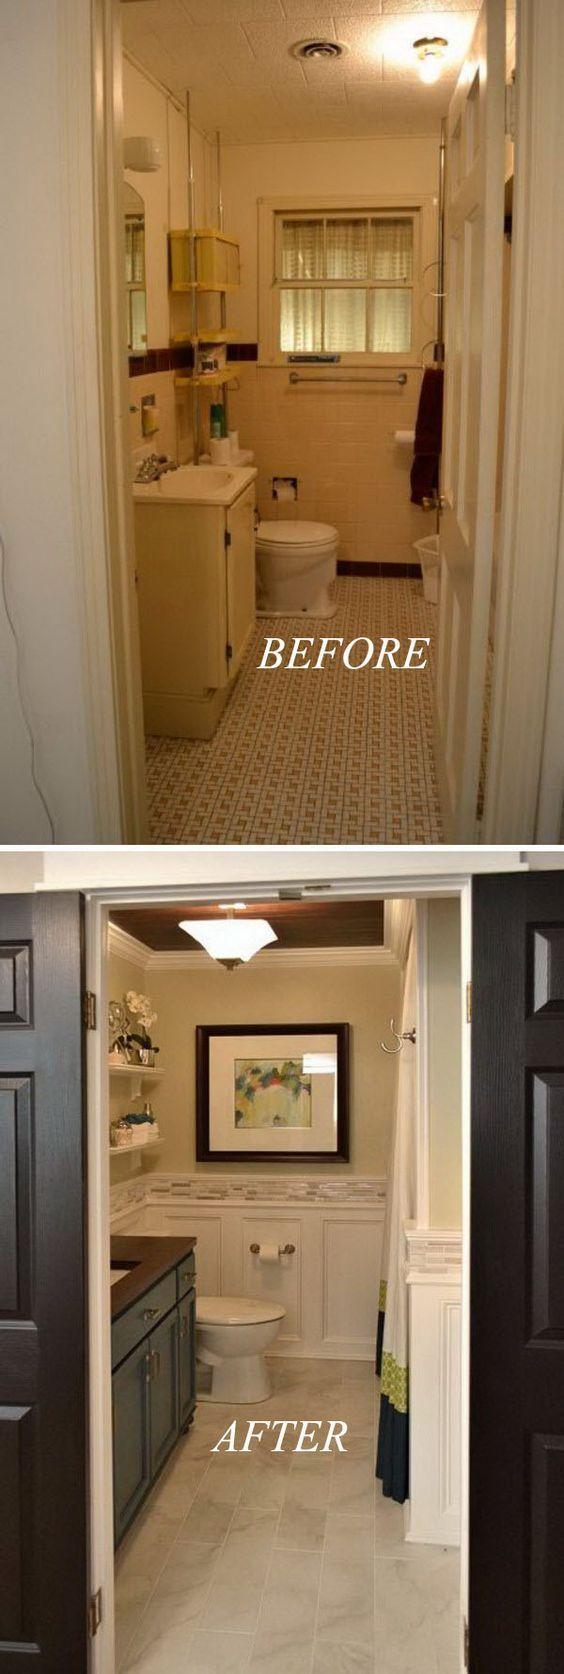 Long Narrow Hall Bath Layout Idea Mirror Image M Small Apartment Bathroom Bathroom Layout Long Narrow Bathroom